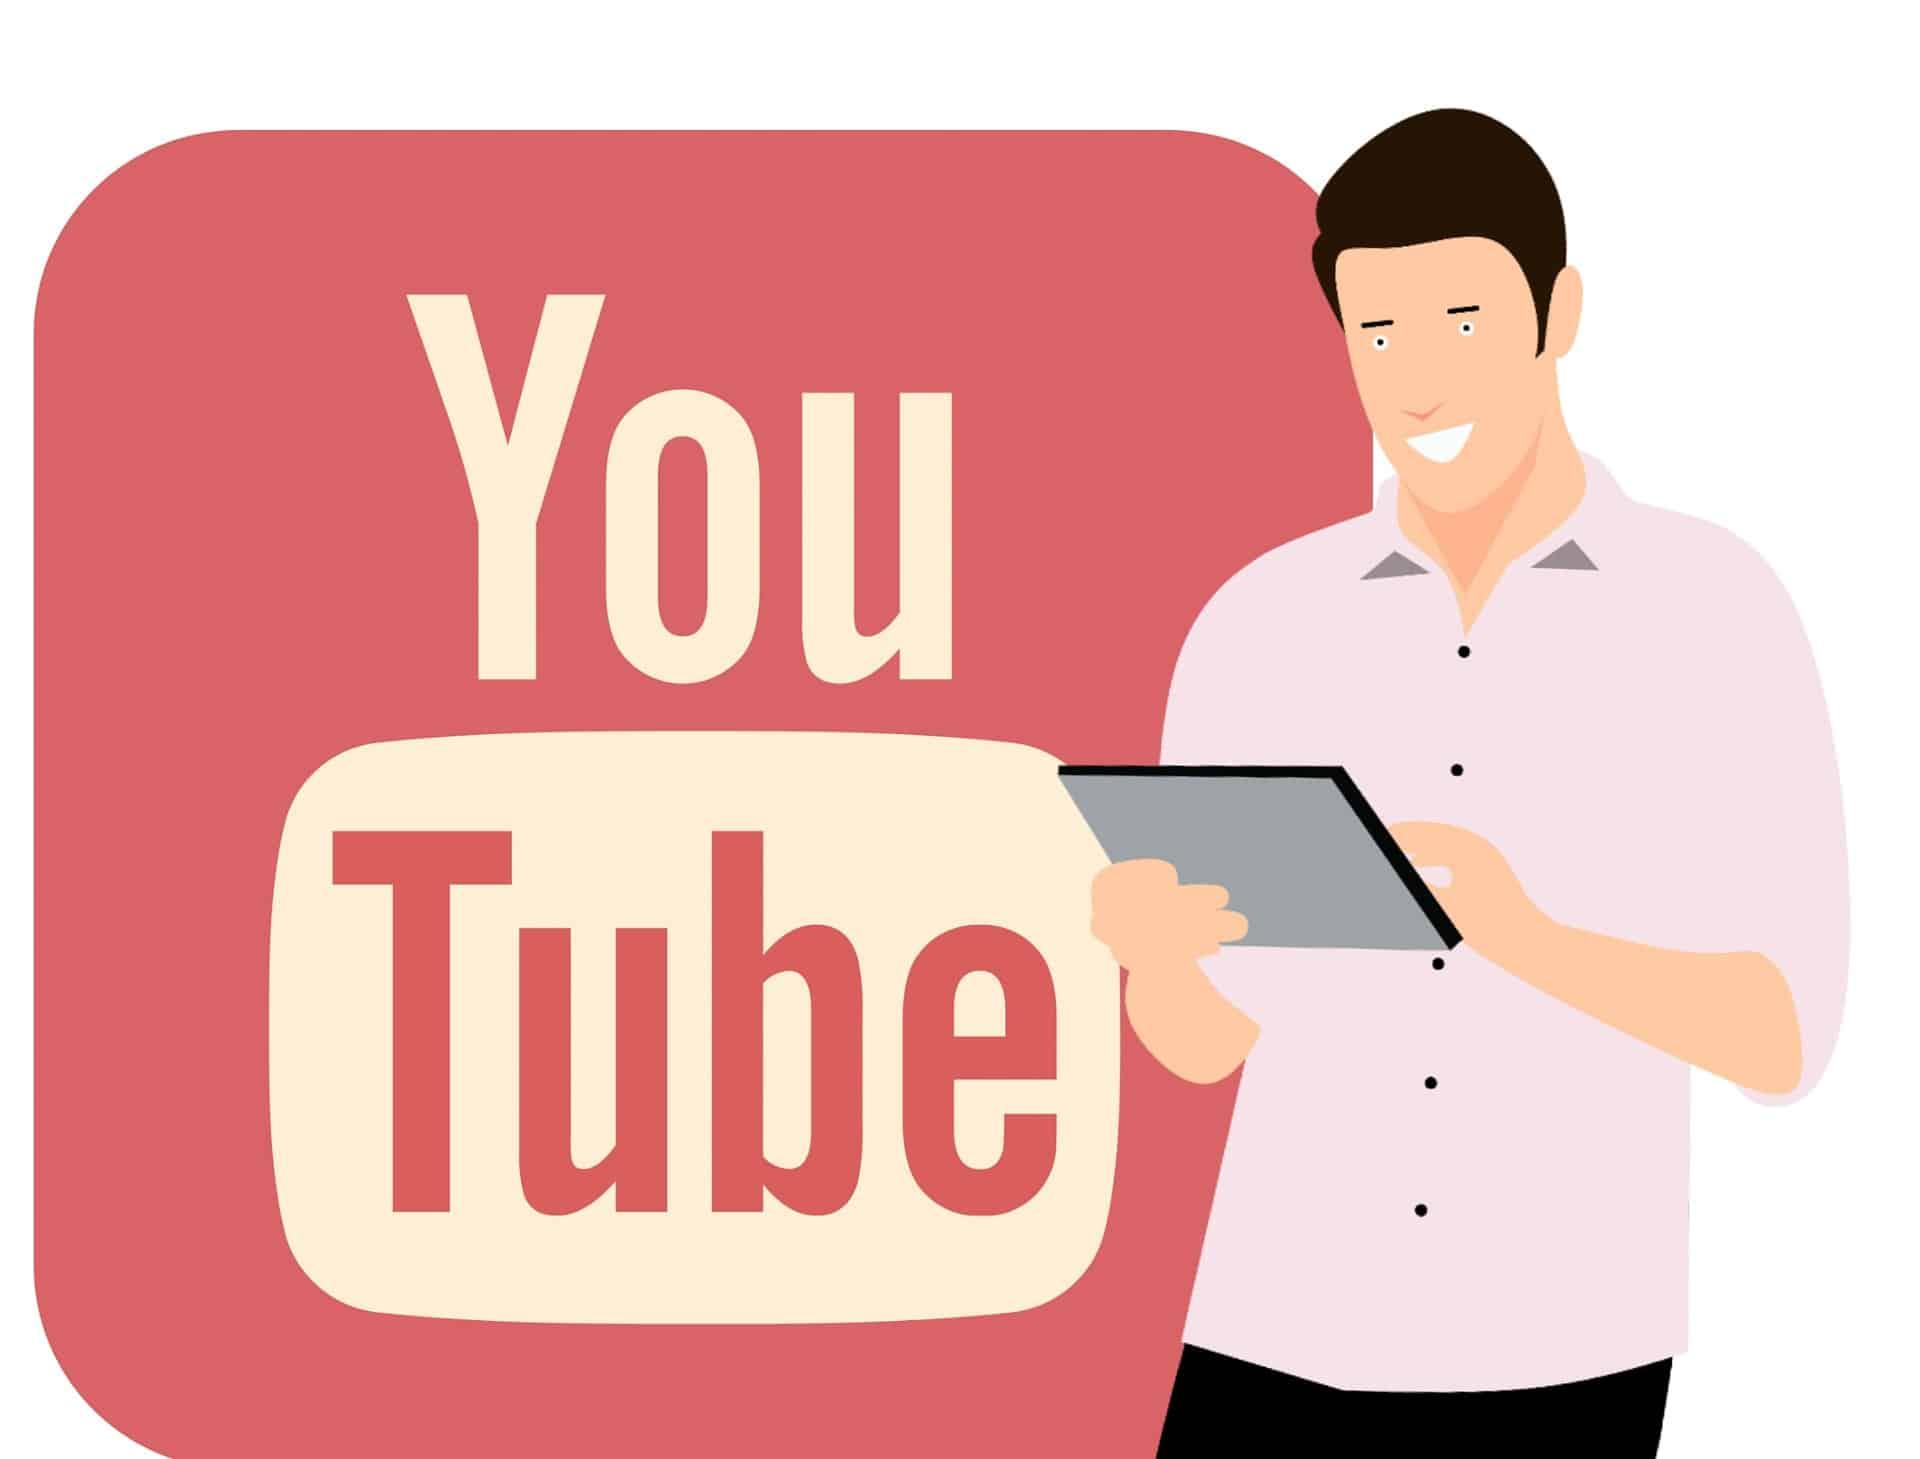 Scaricare i video musicali di YouTube in mp3